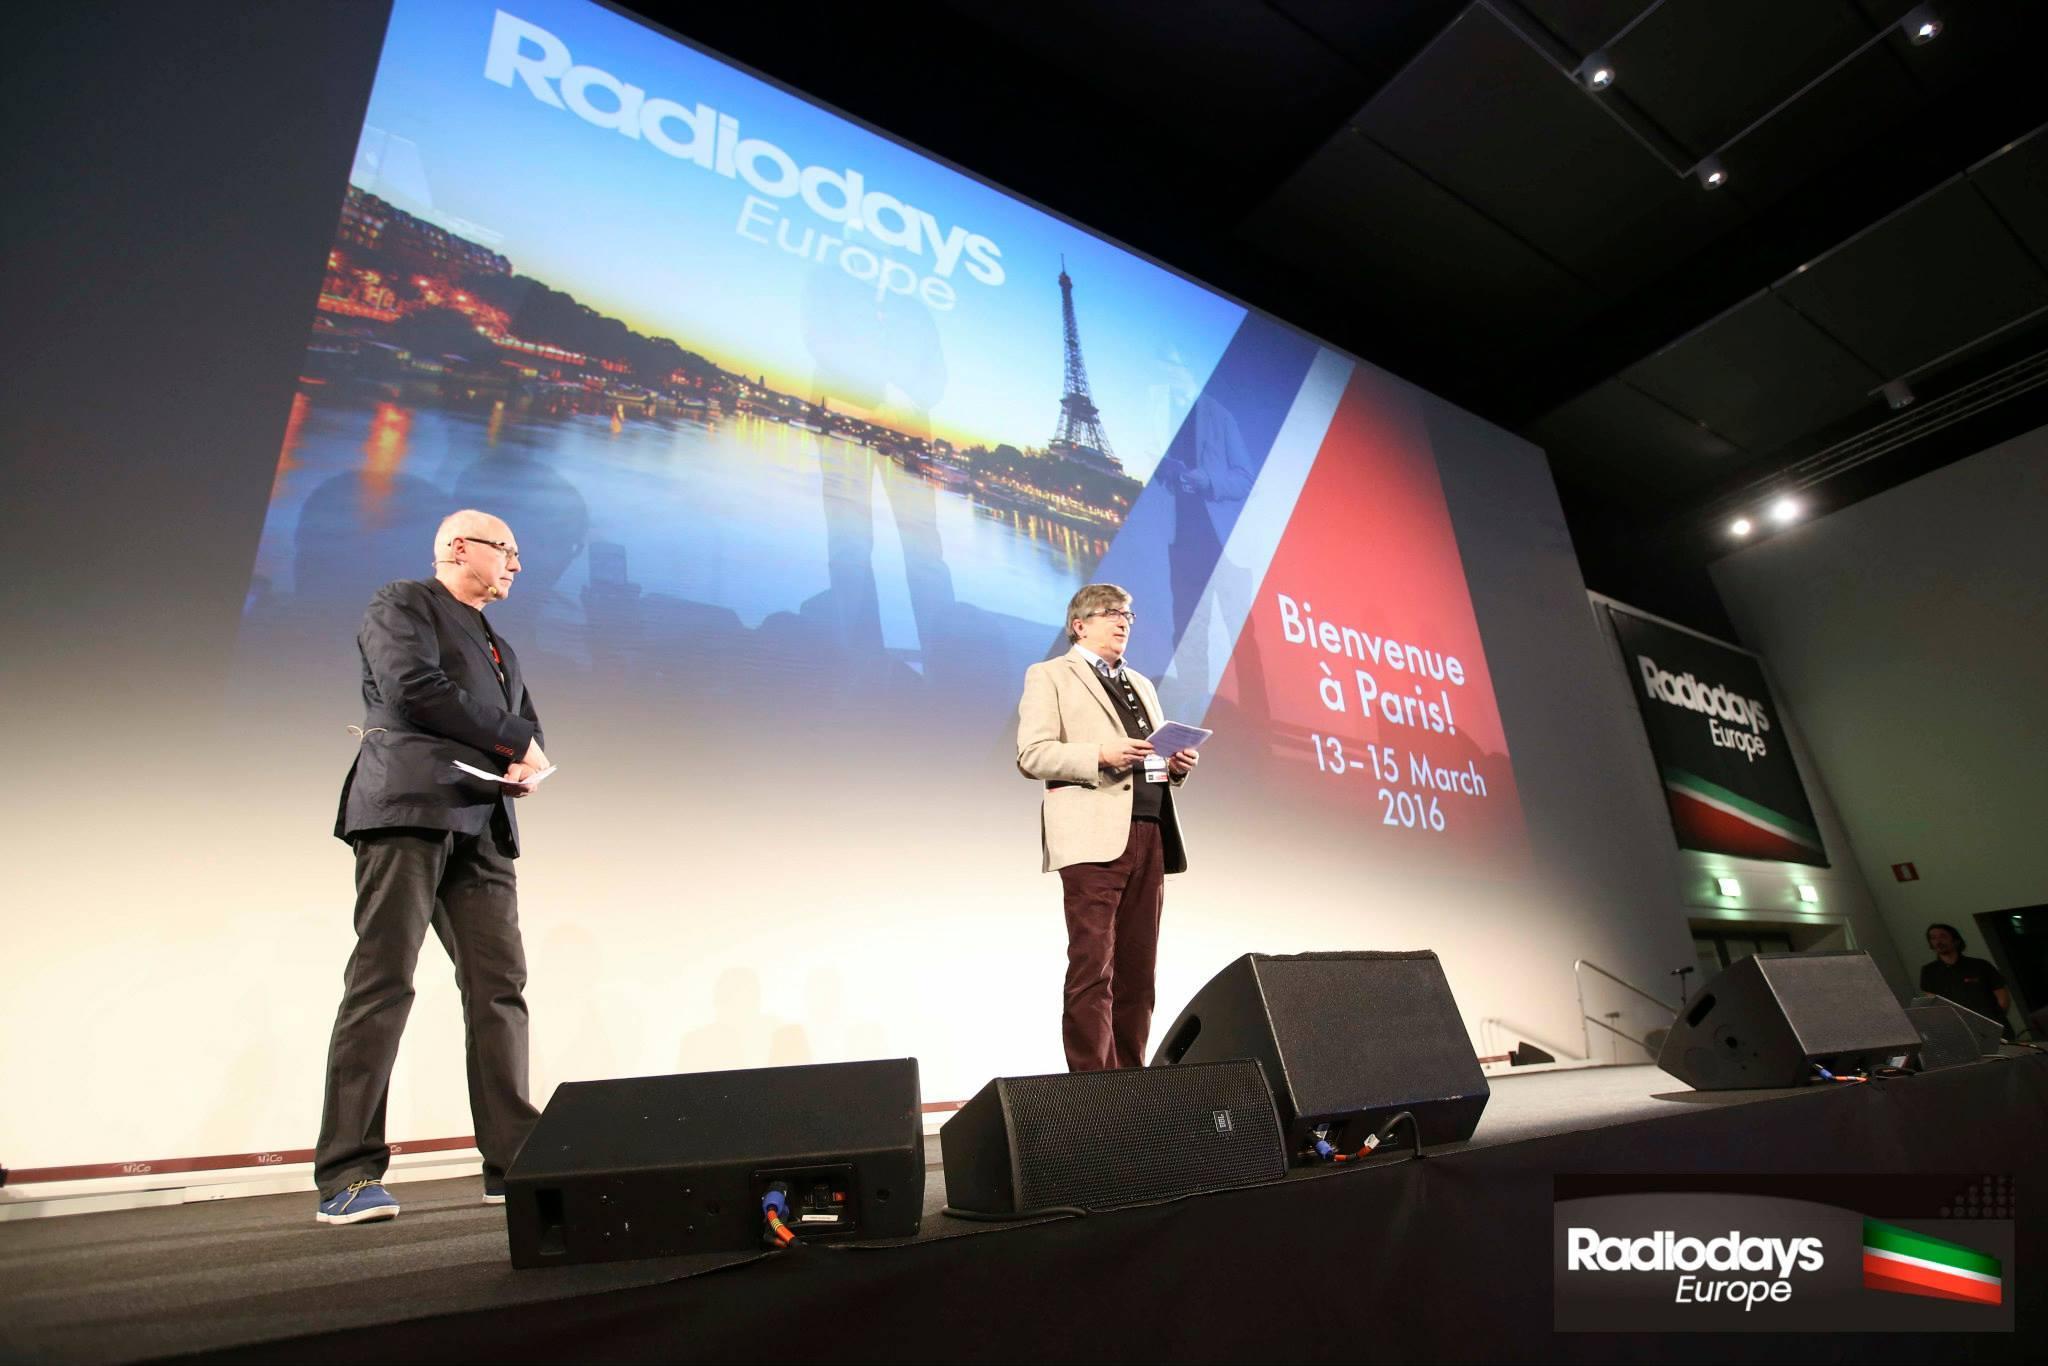 Le suédois Anders Held et le norvégien Rolf Brandrud : les organisteurs des Radiodays Europe